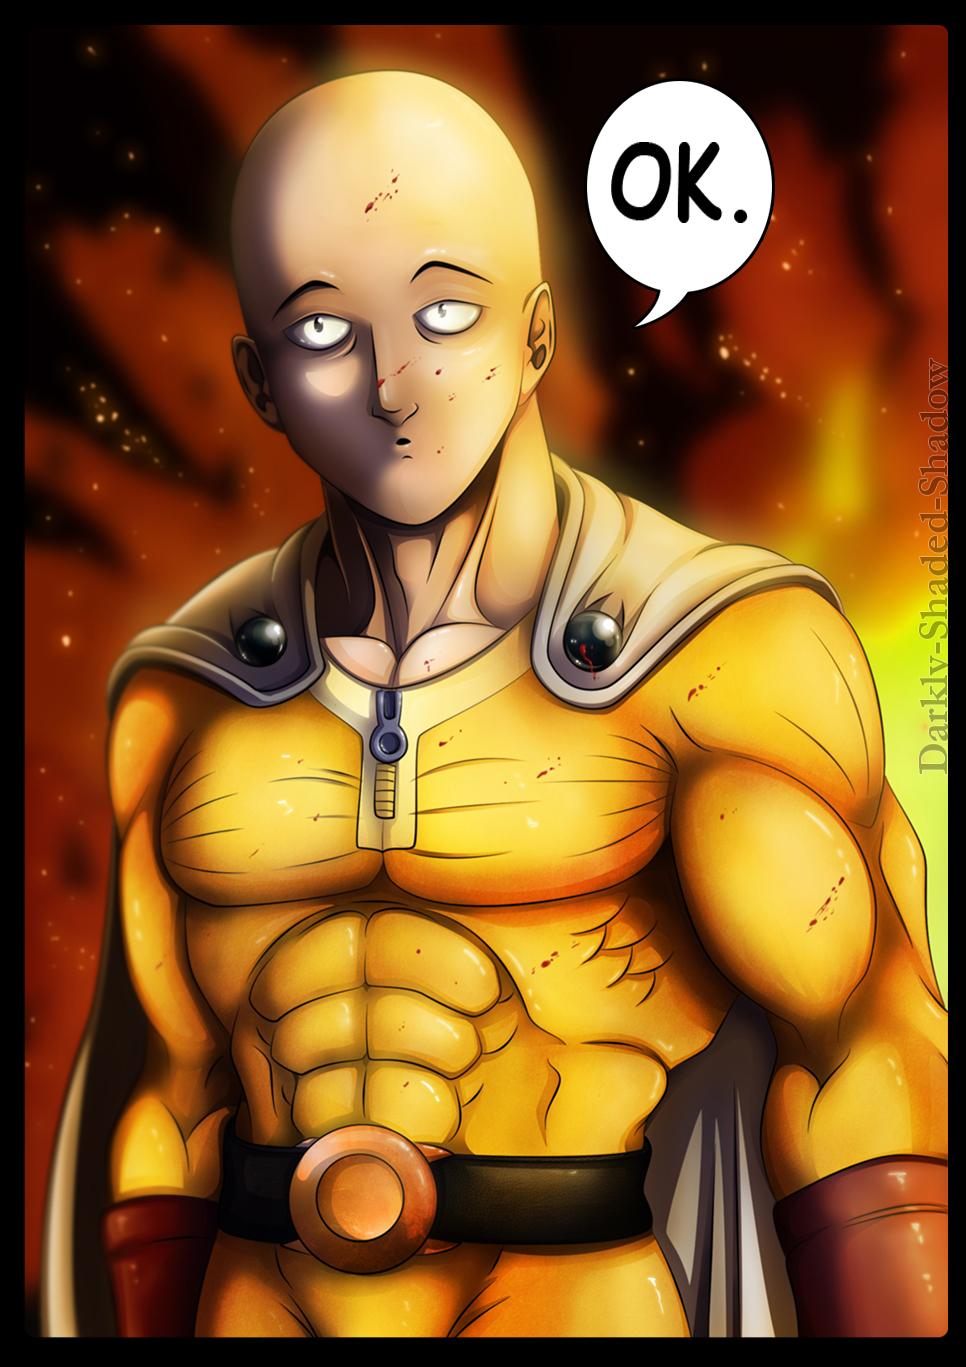 Saitama - One Punch Man by darkly-shaded-shadow on DeviantArt